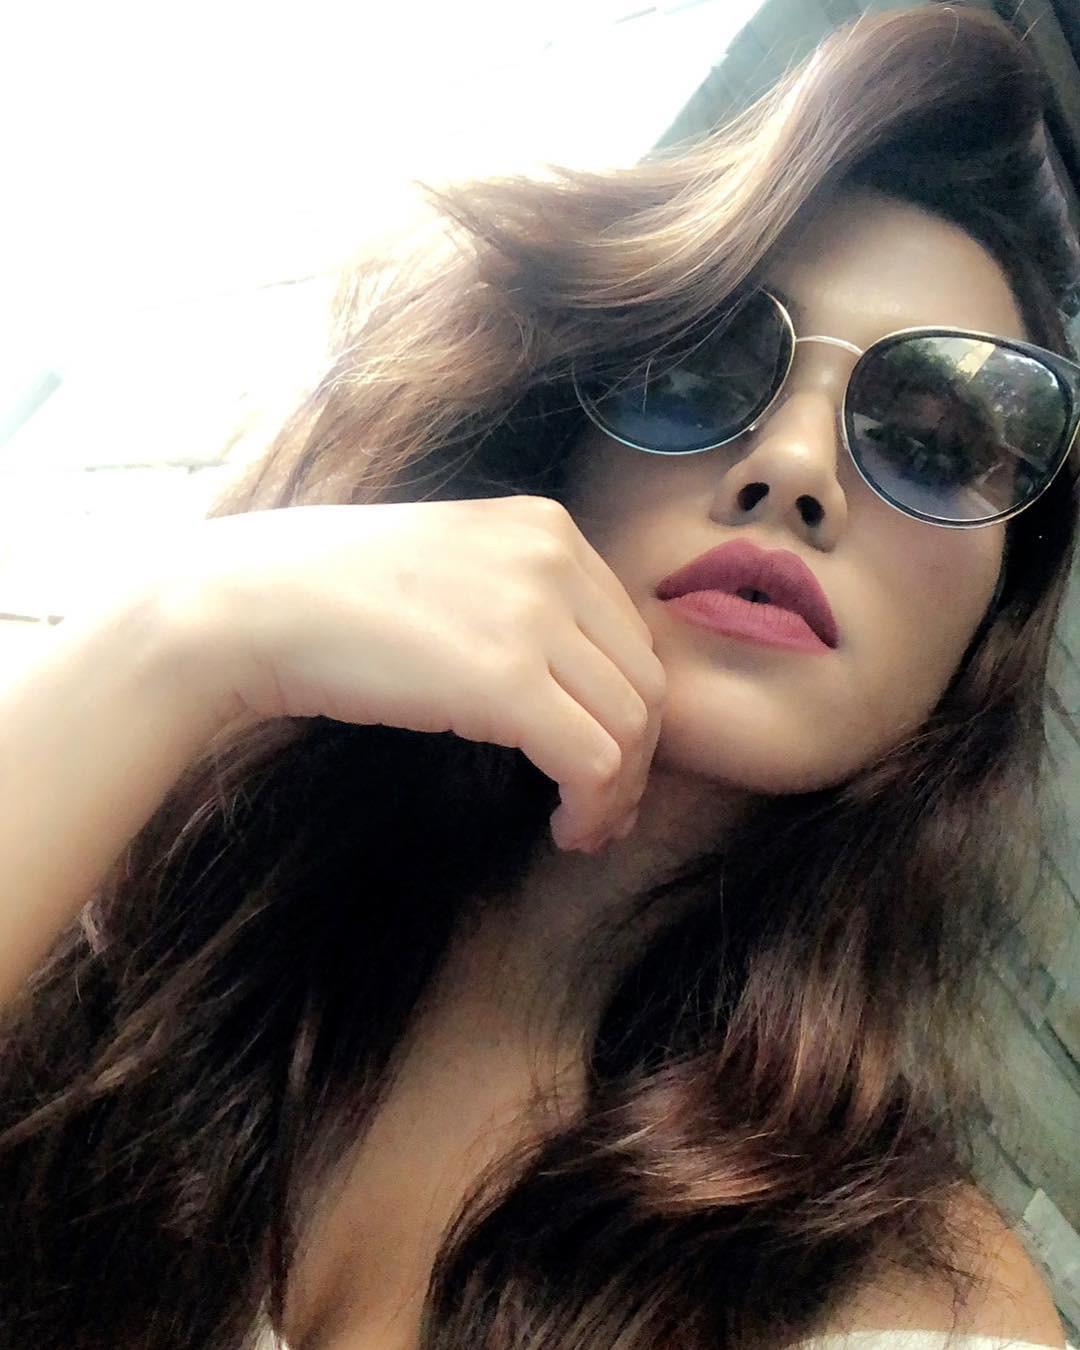 Stunning Photos Of Model Purbaasha Das